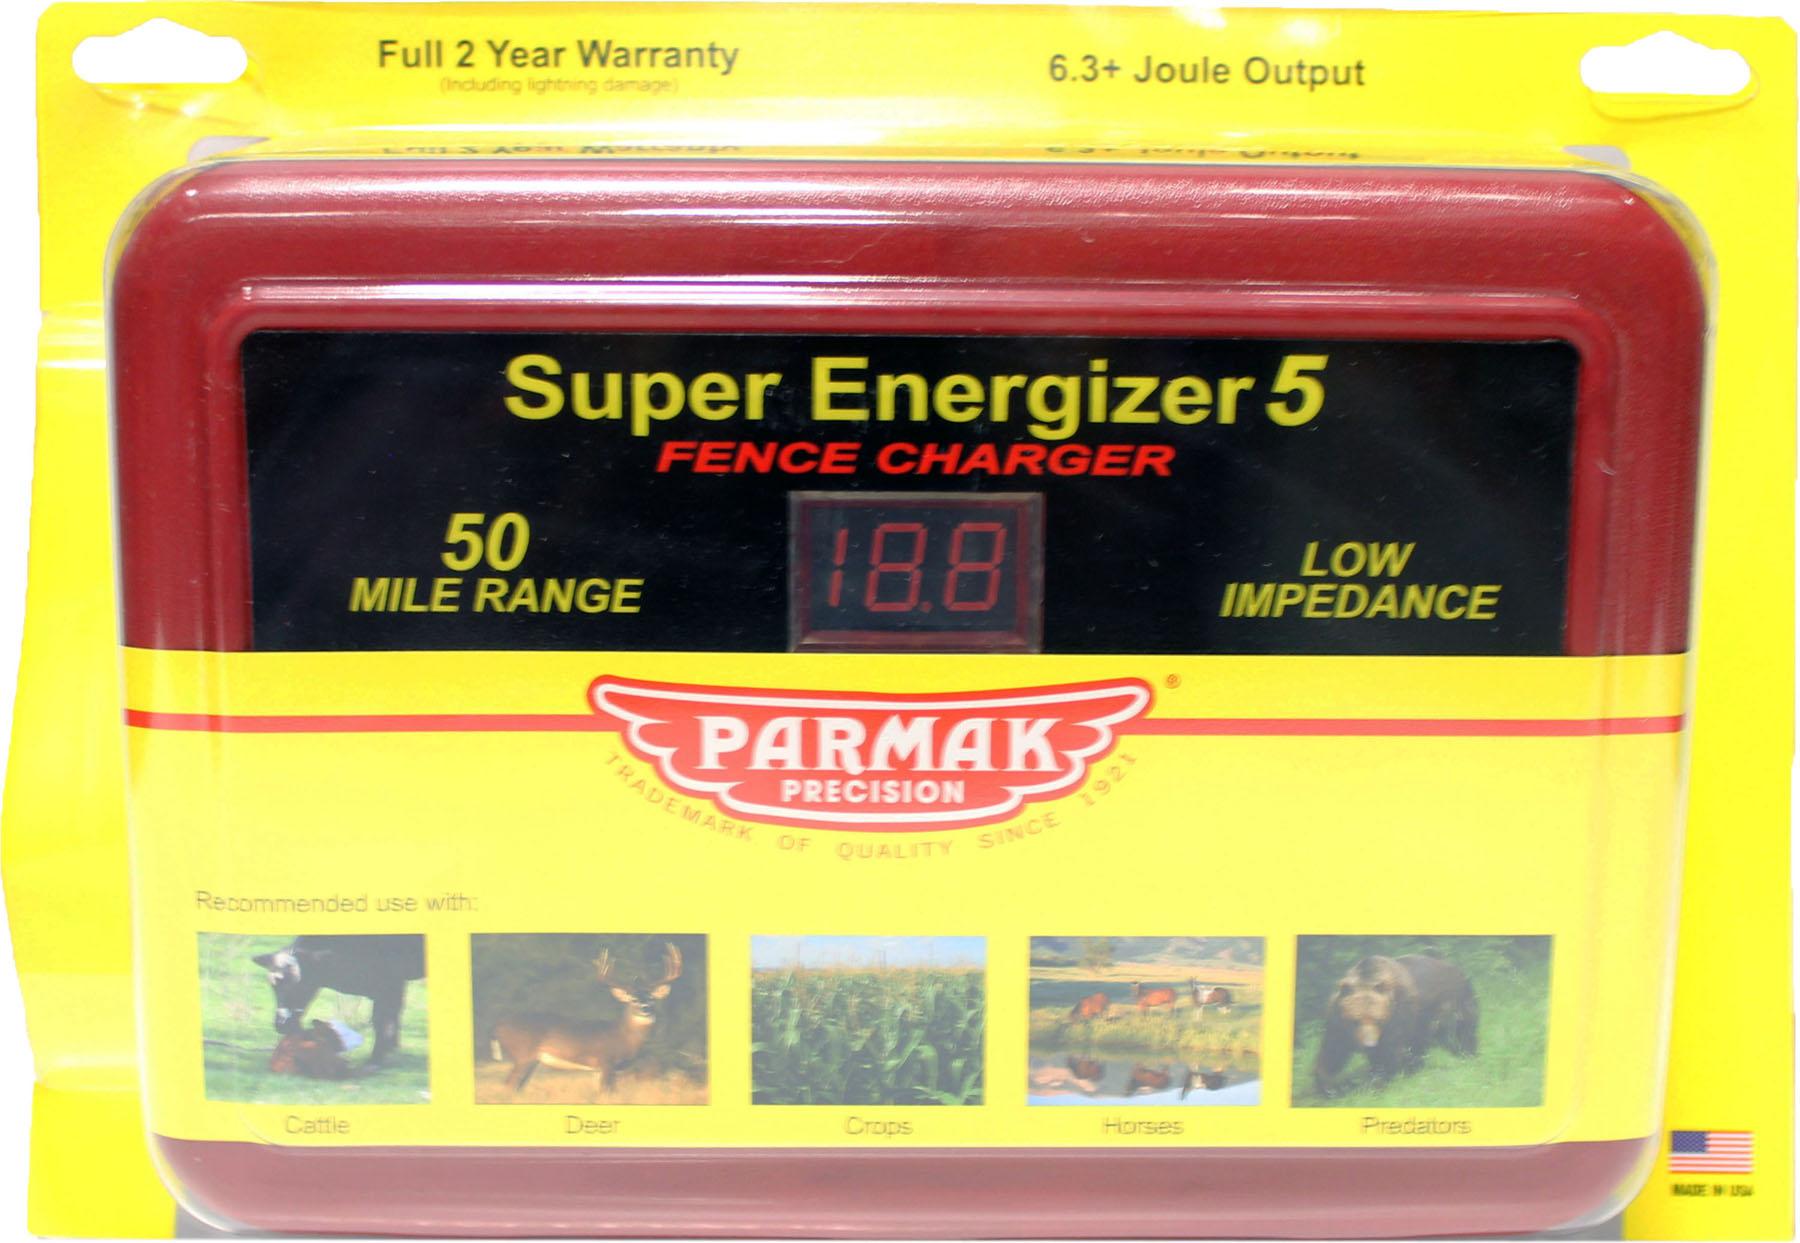 parmak super energizer5 fence charger